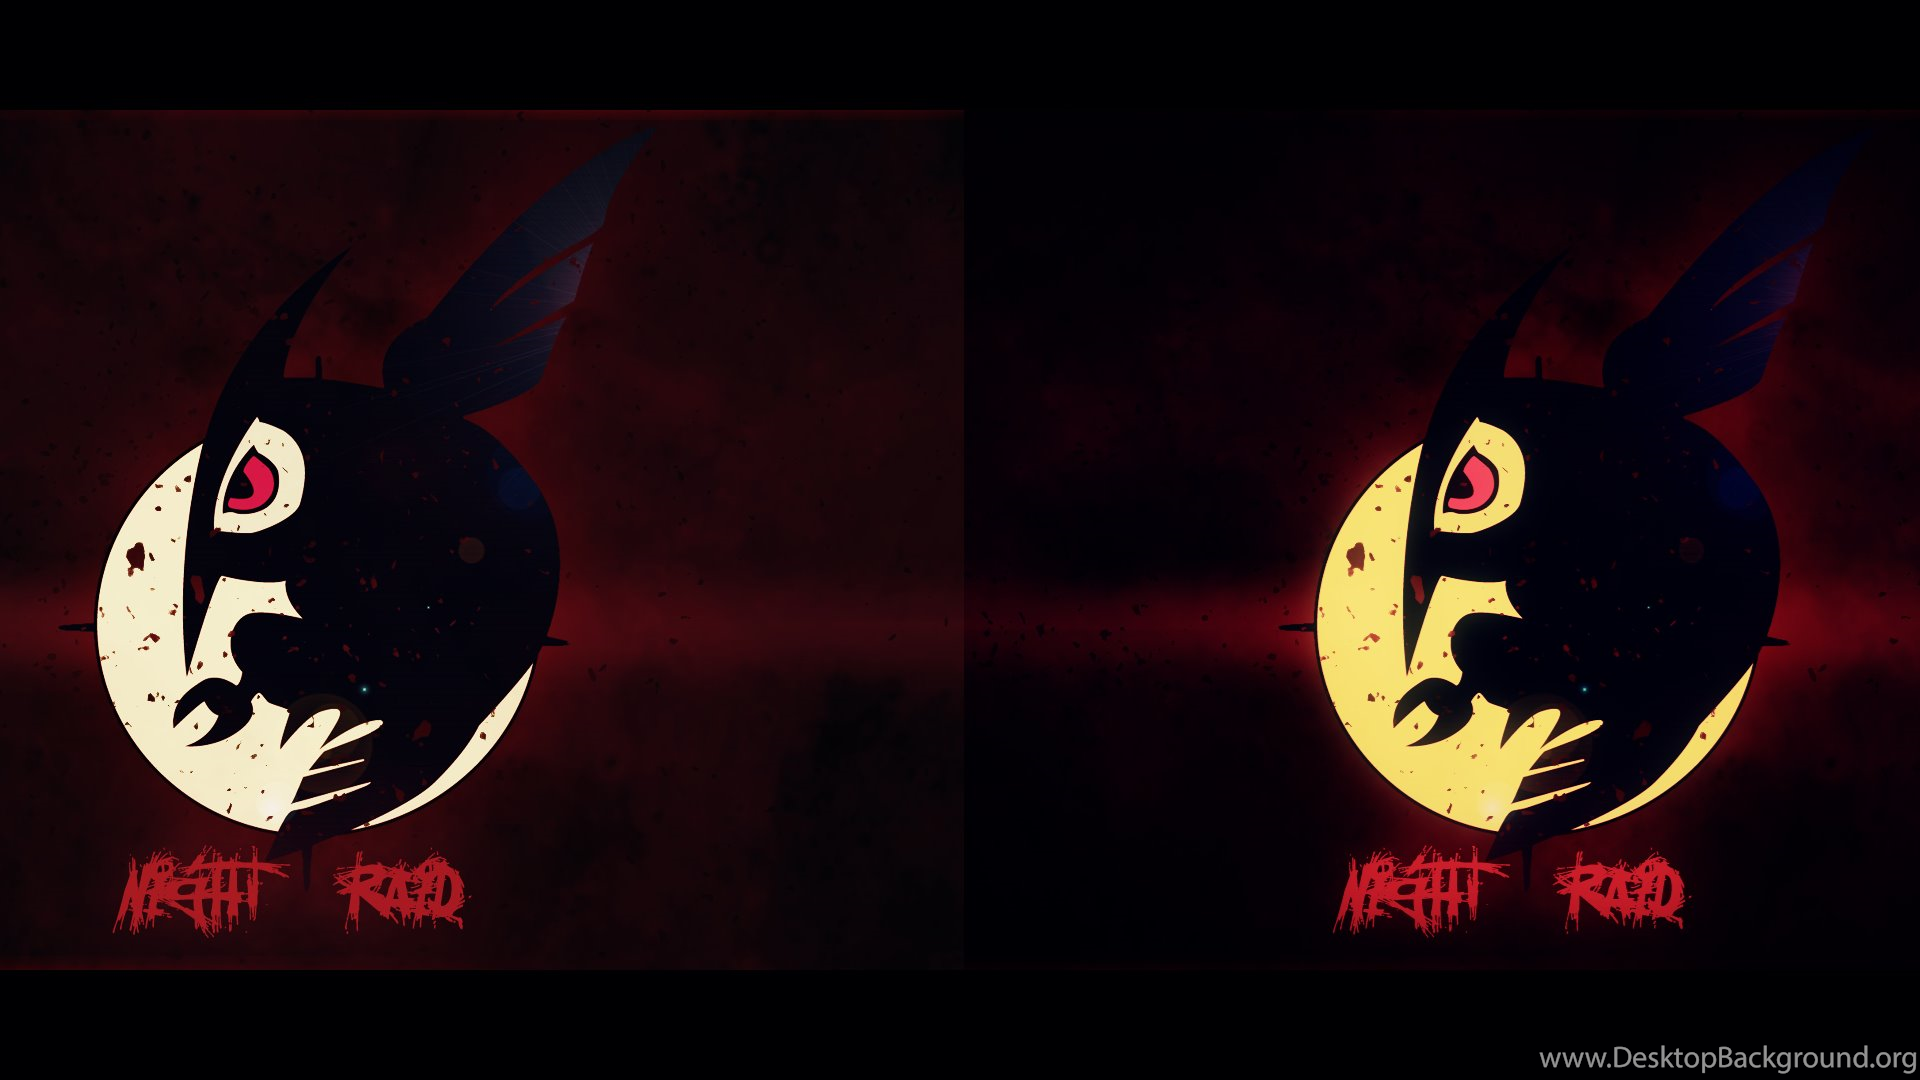 Night Wallpaper No Logo By Ualgreymon On Deviantart: DeviantArt: More Like Akame Ga Kill: Night Raid Logo